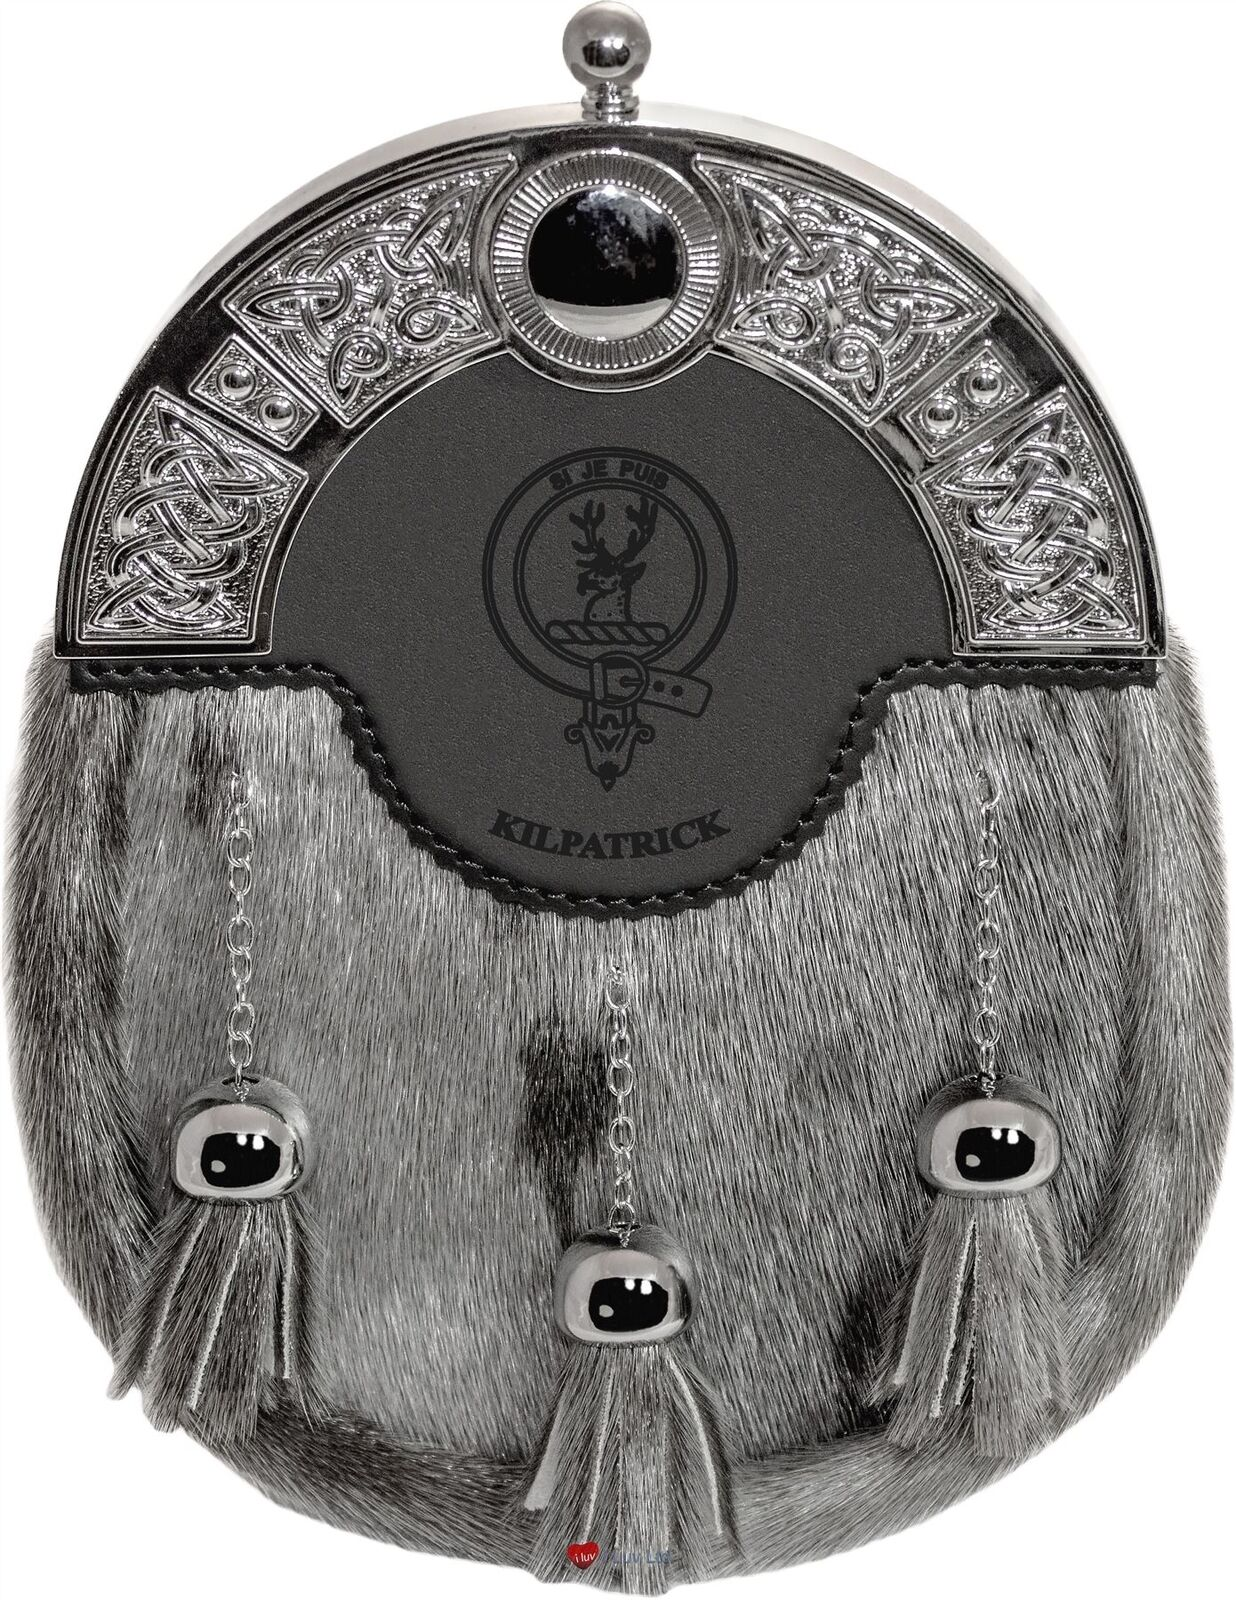 Kilpatrick Dress Sporran 3 Tassels Studded Celtic Arch Scottish Clan Crest